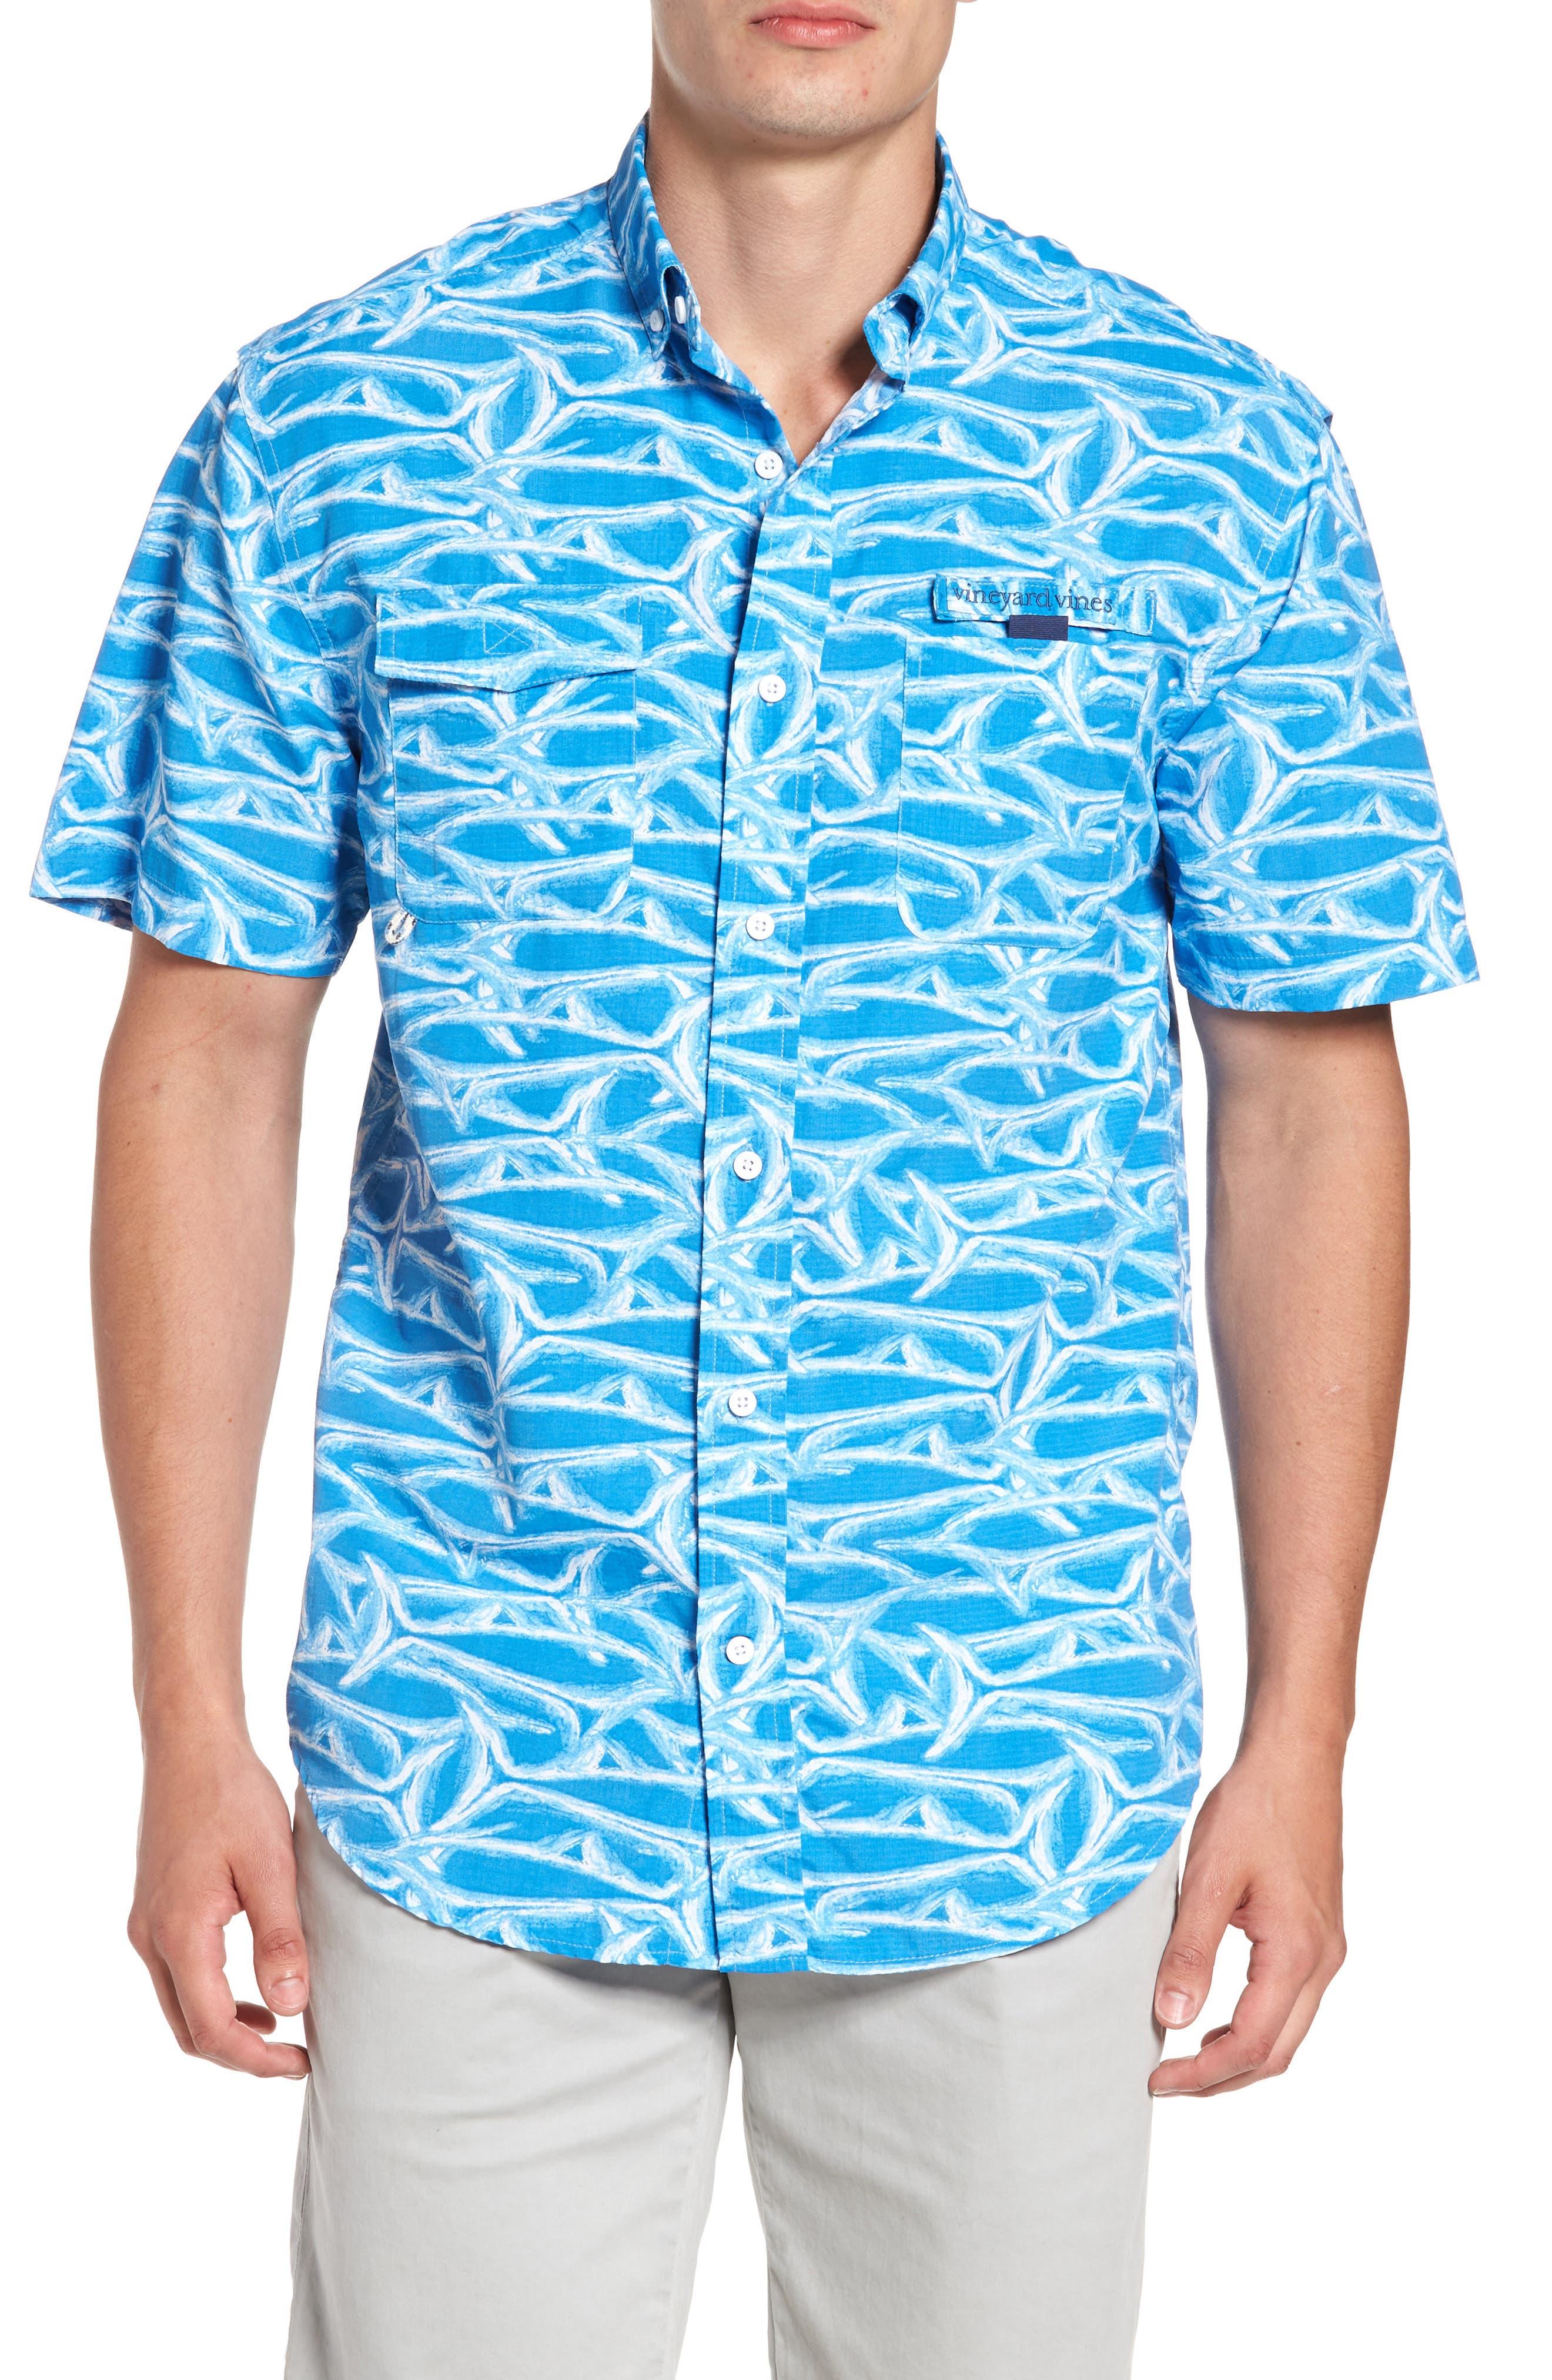 Alternate Image 1 Selected - vineyard vines Harbor Brushed Marlin Fishing Shirt